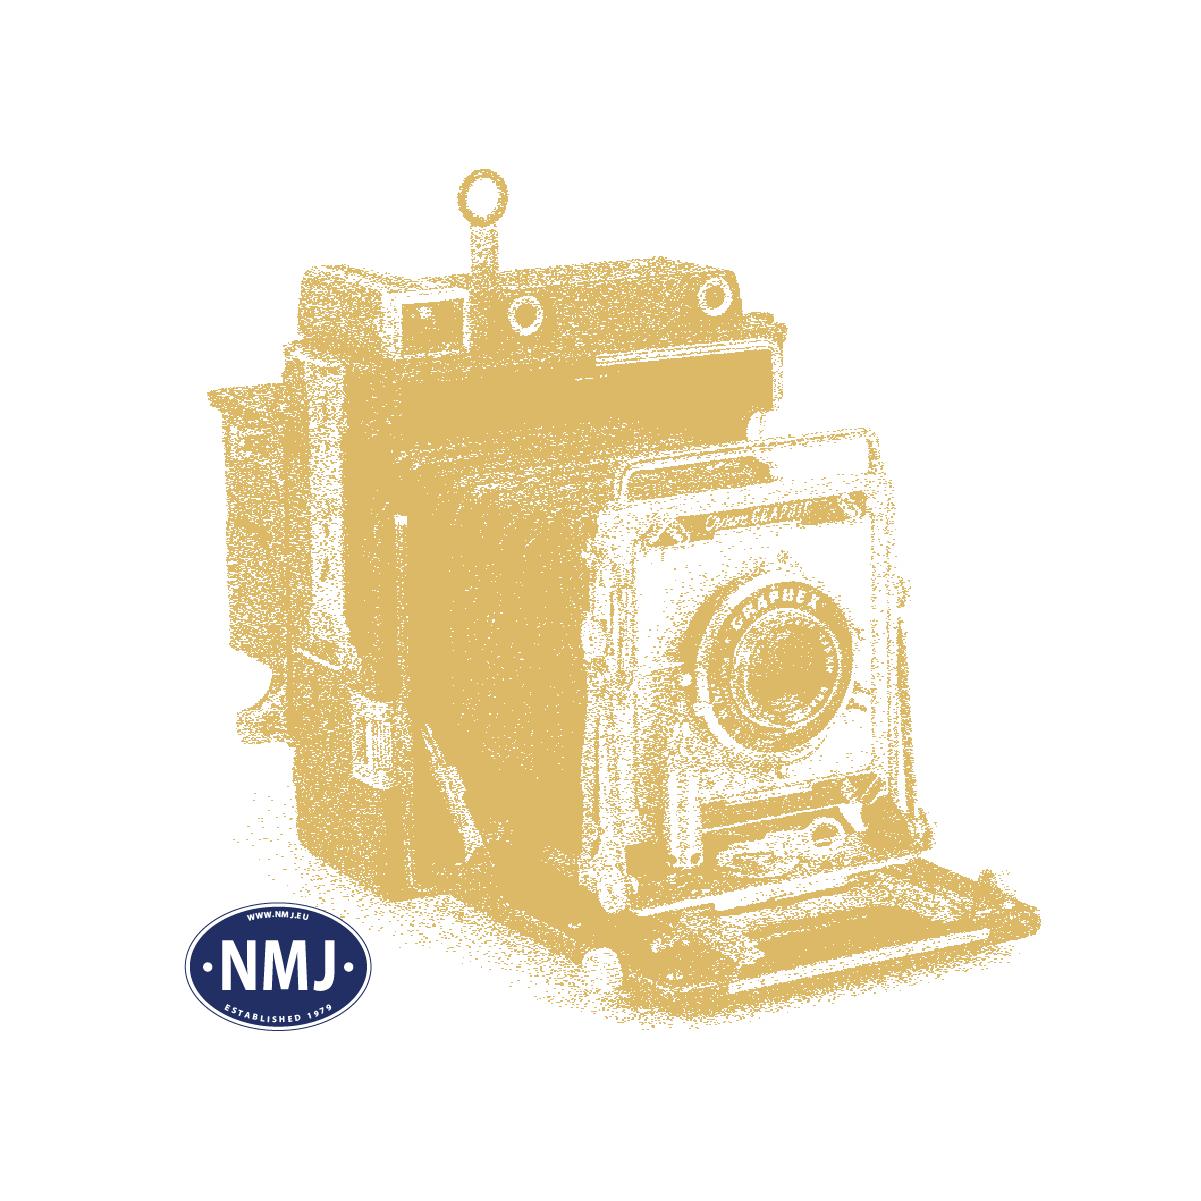 NMJT107.302 - NMJ Topline NSB B3-2 25565 Nydesign